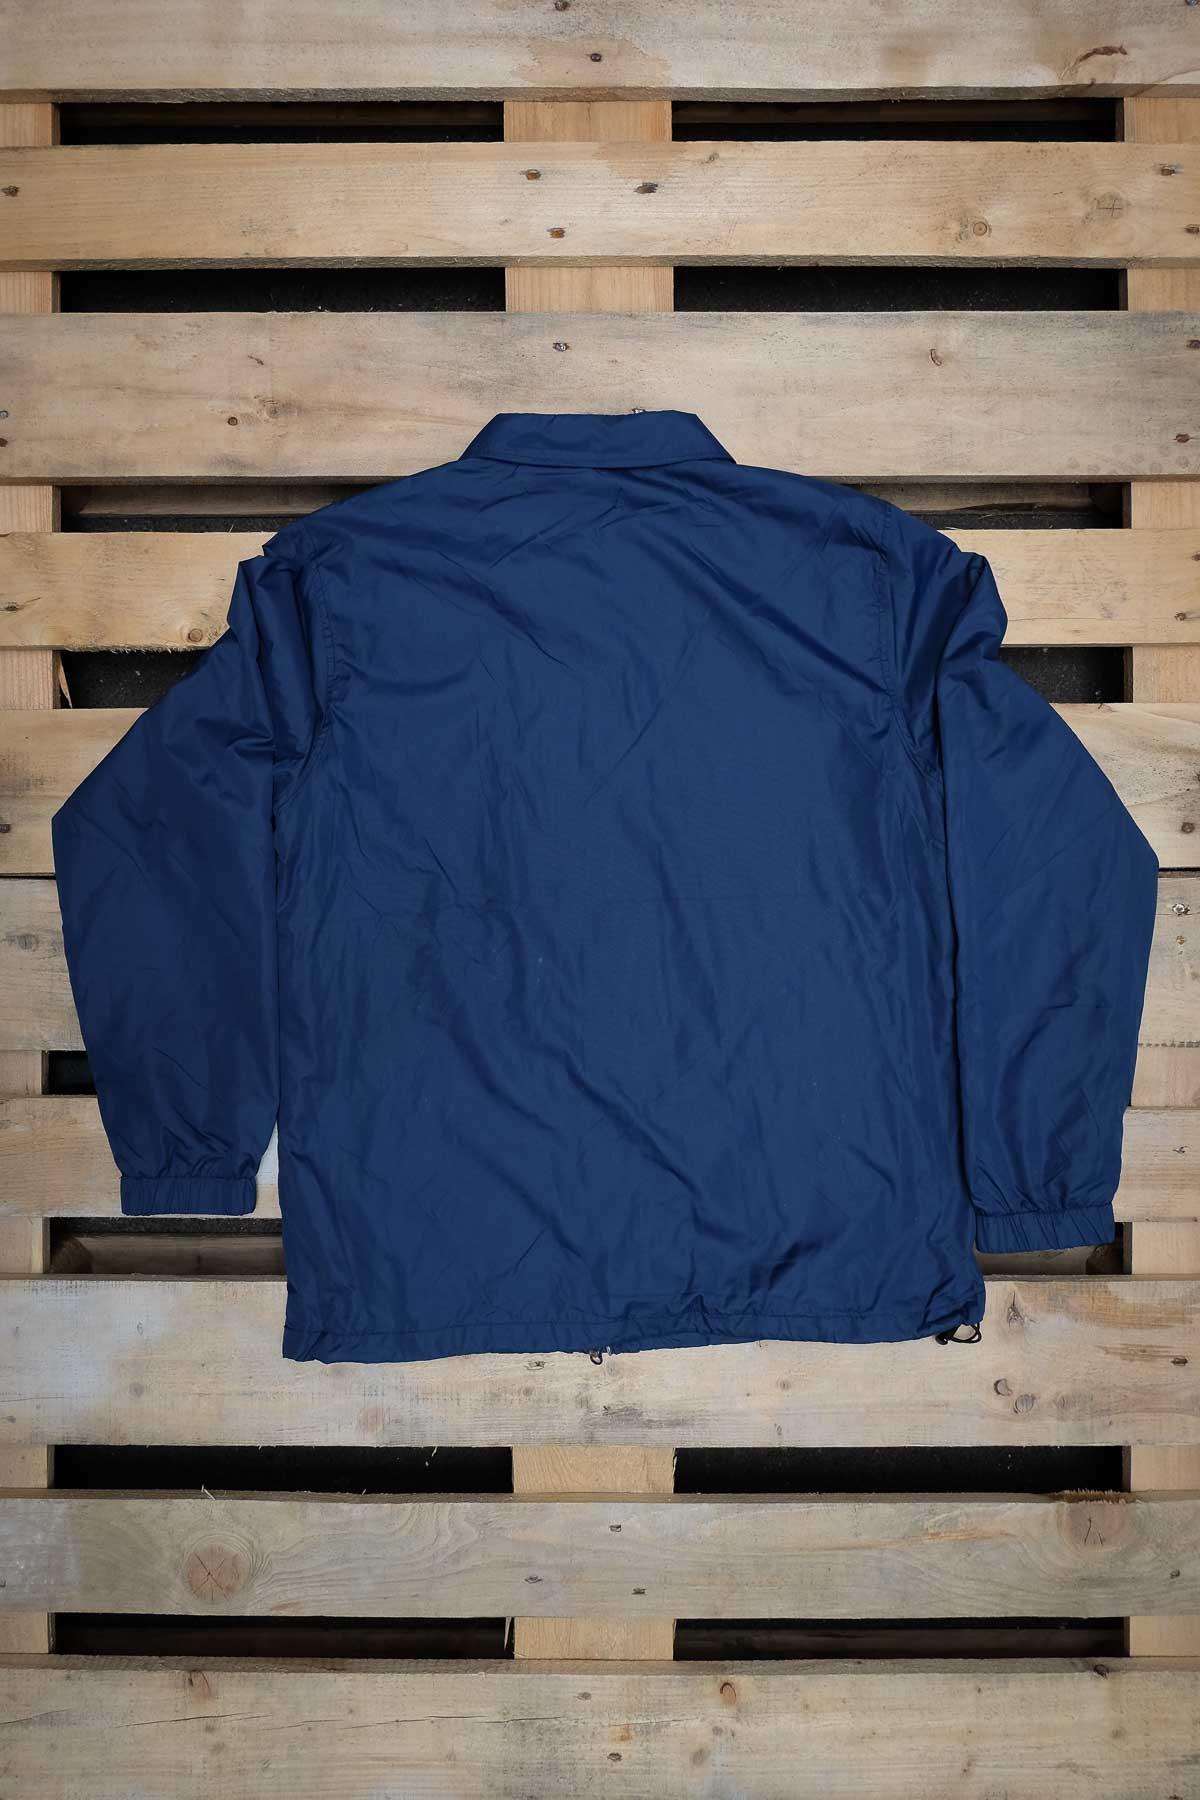 Full Mine COACH Jacket Blue